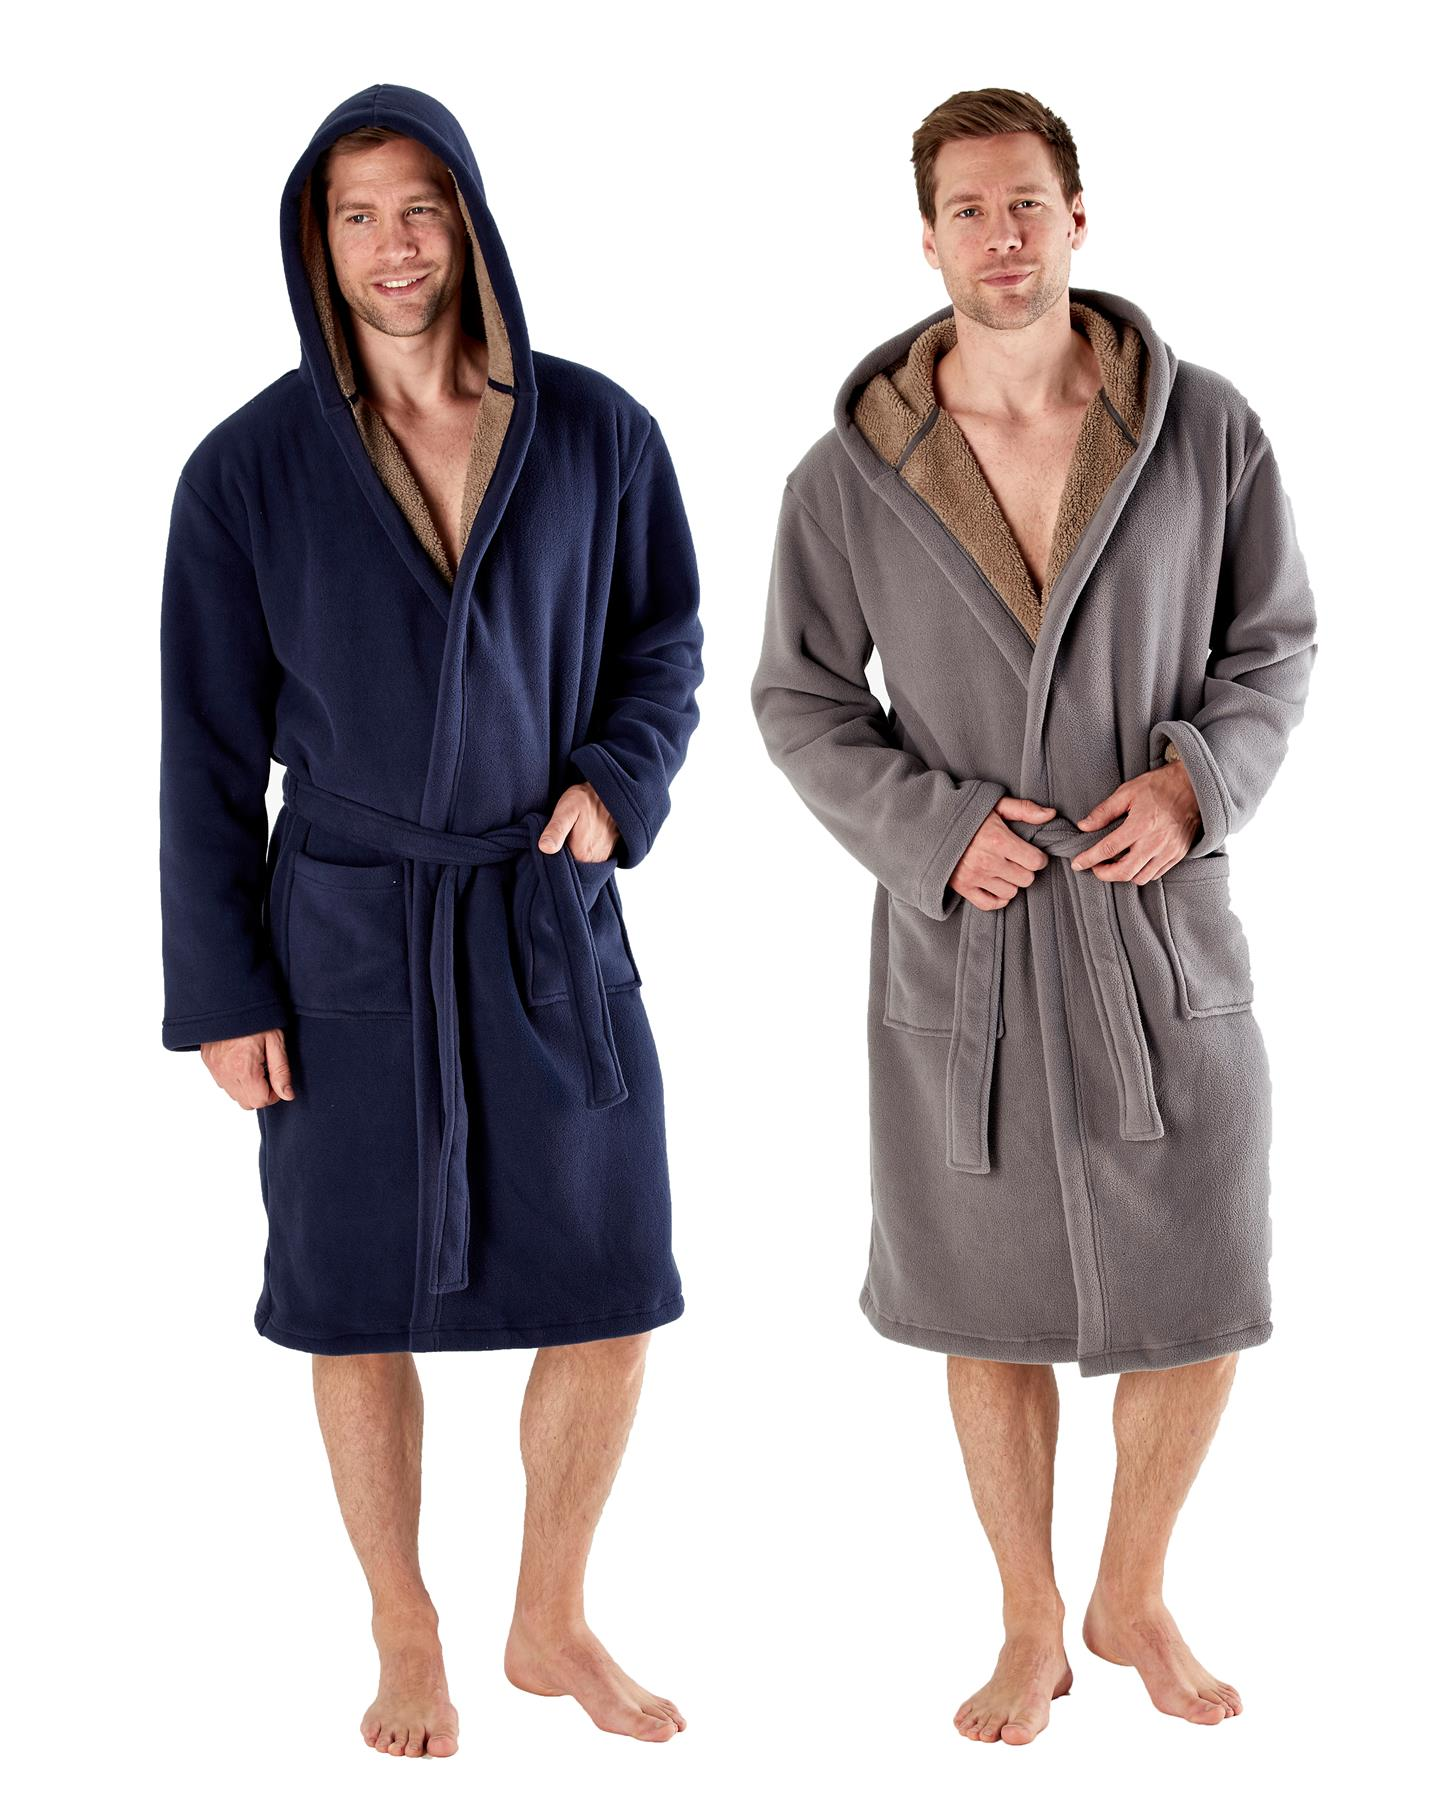 Mens Hooded Robe Luxury Sherpa Lined Bonded Fleece Bathrobe Dressing Gown Ebay